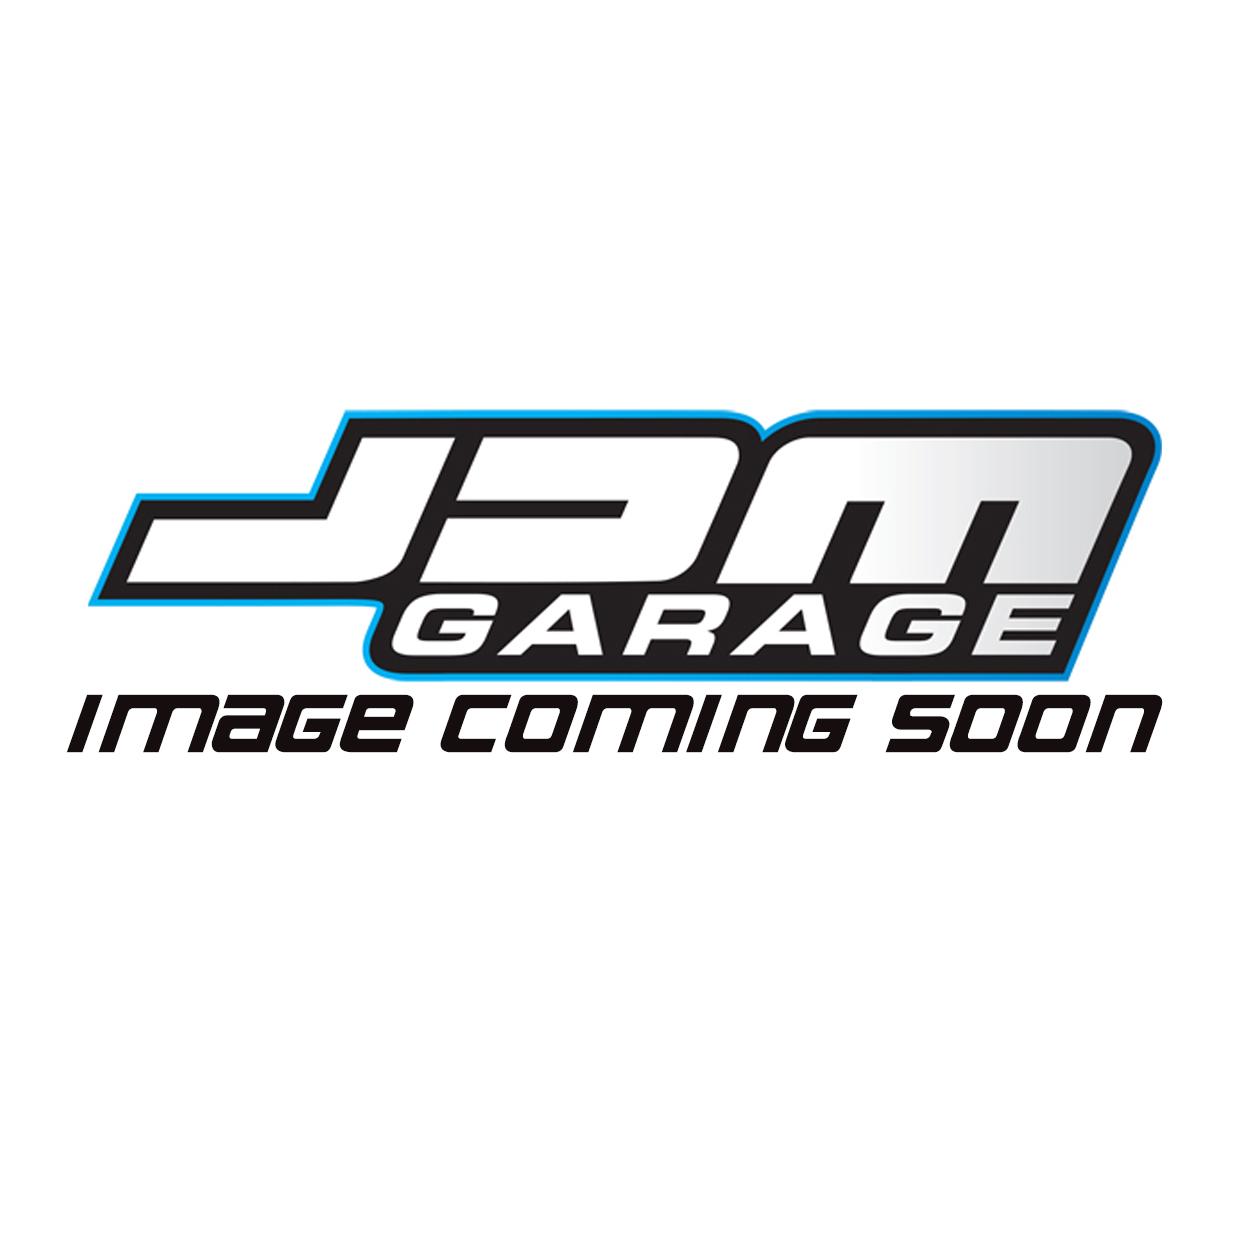 Link Dash2 Pro - LCD / LED display